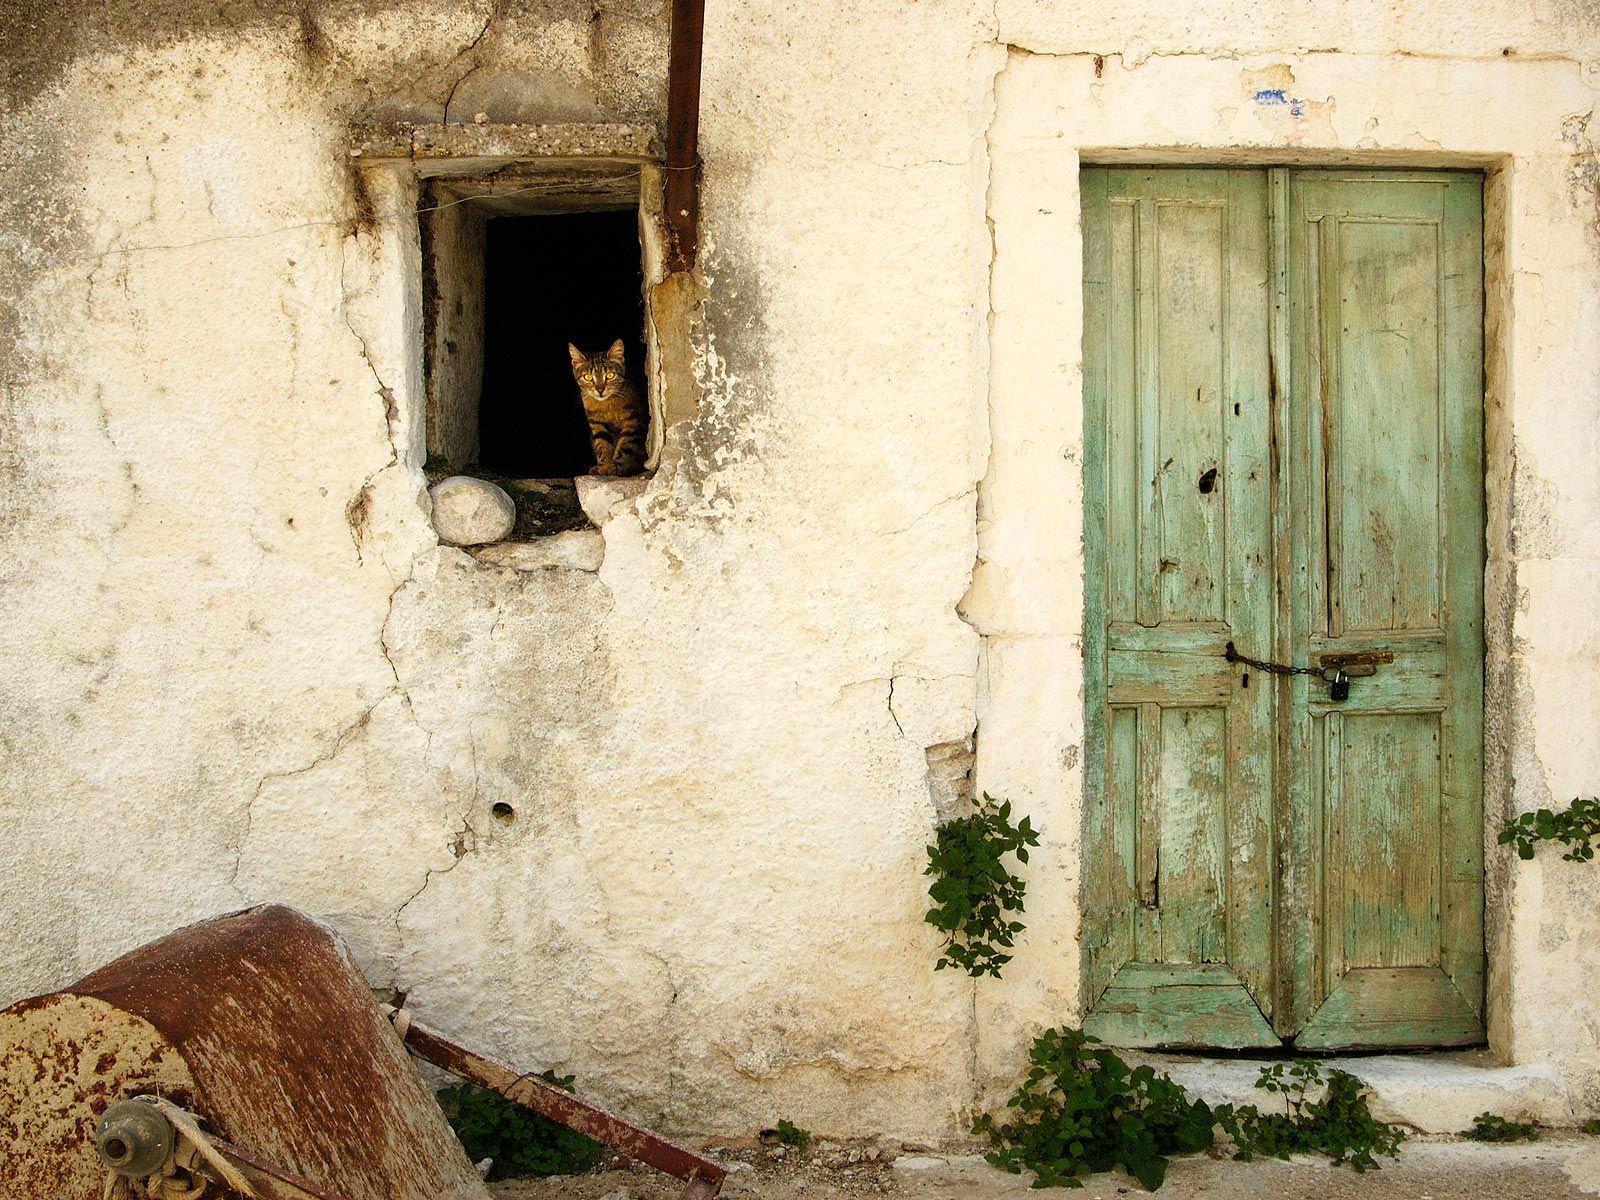 Pin By Shady Al Grager On Desktop Wallpapers Cat Window Green Door House Windows